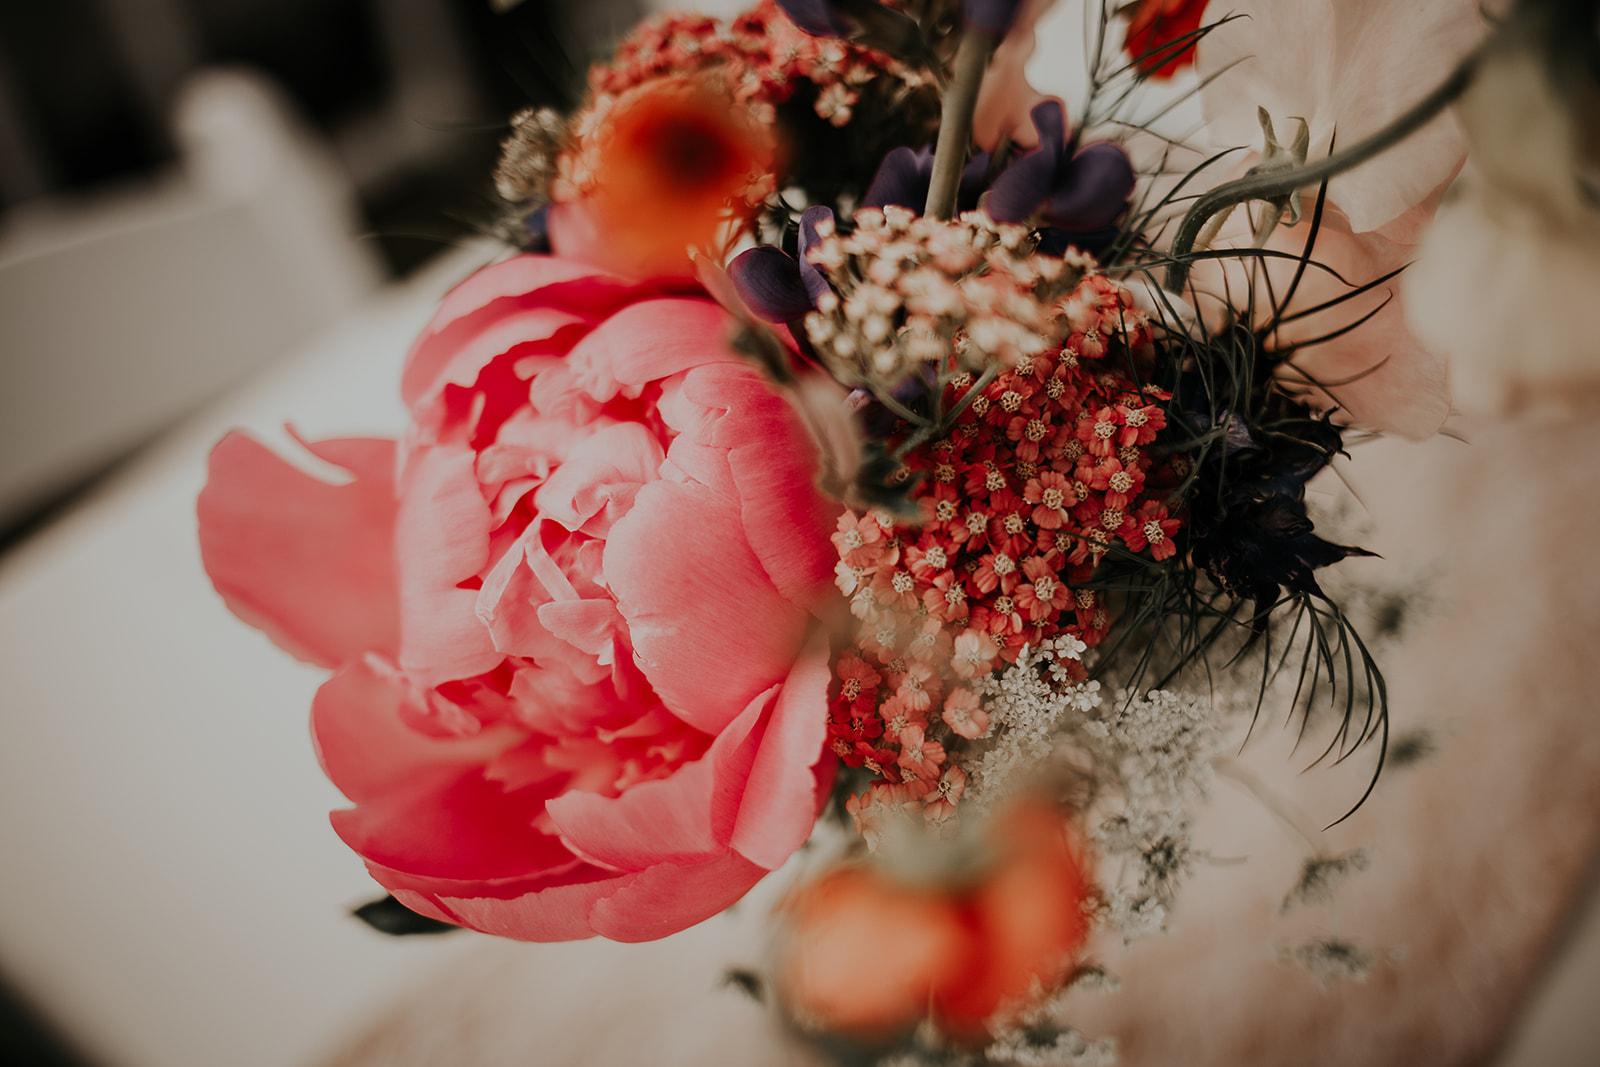 north-cascades-elopement-wedding-winthrop-wedding-photographer-megan-gallagher-photography (2).jpg